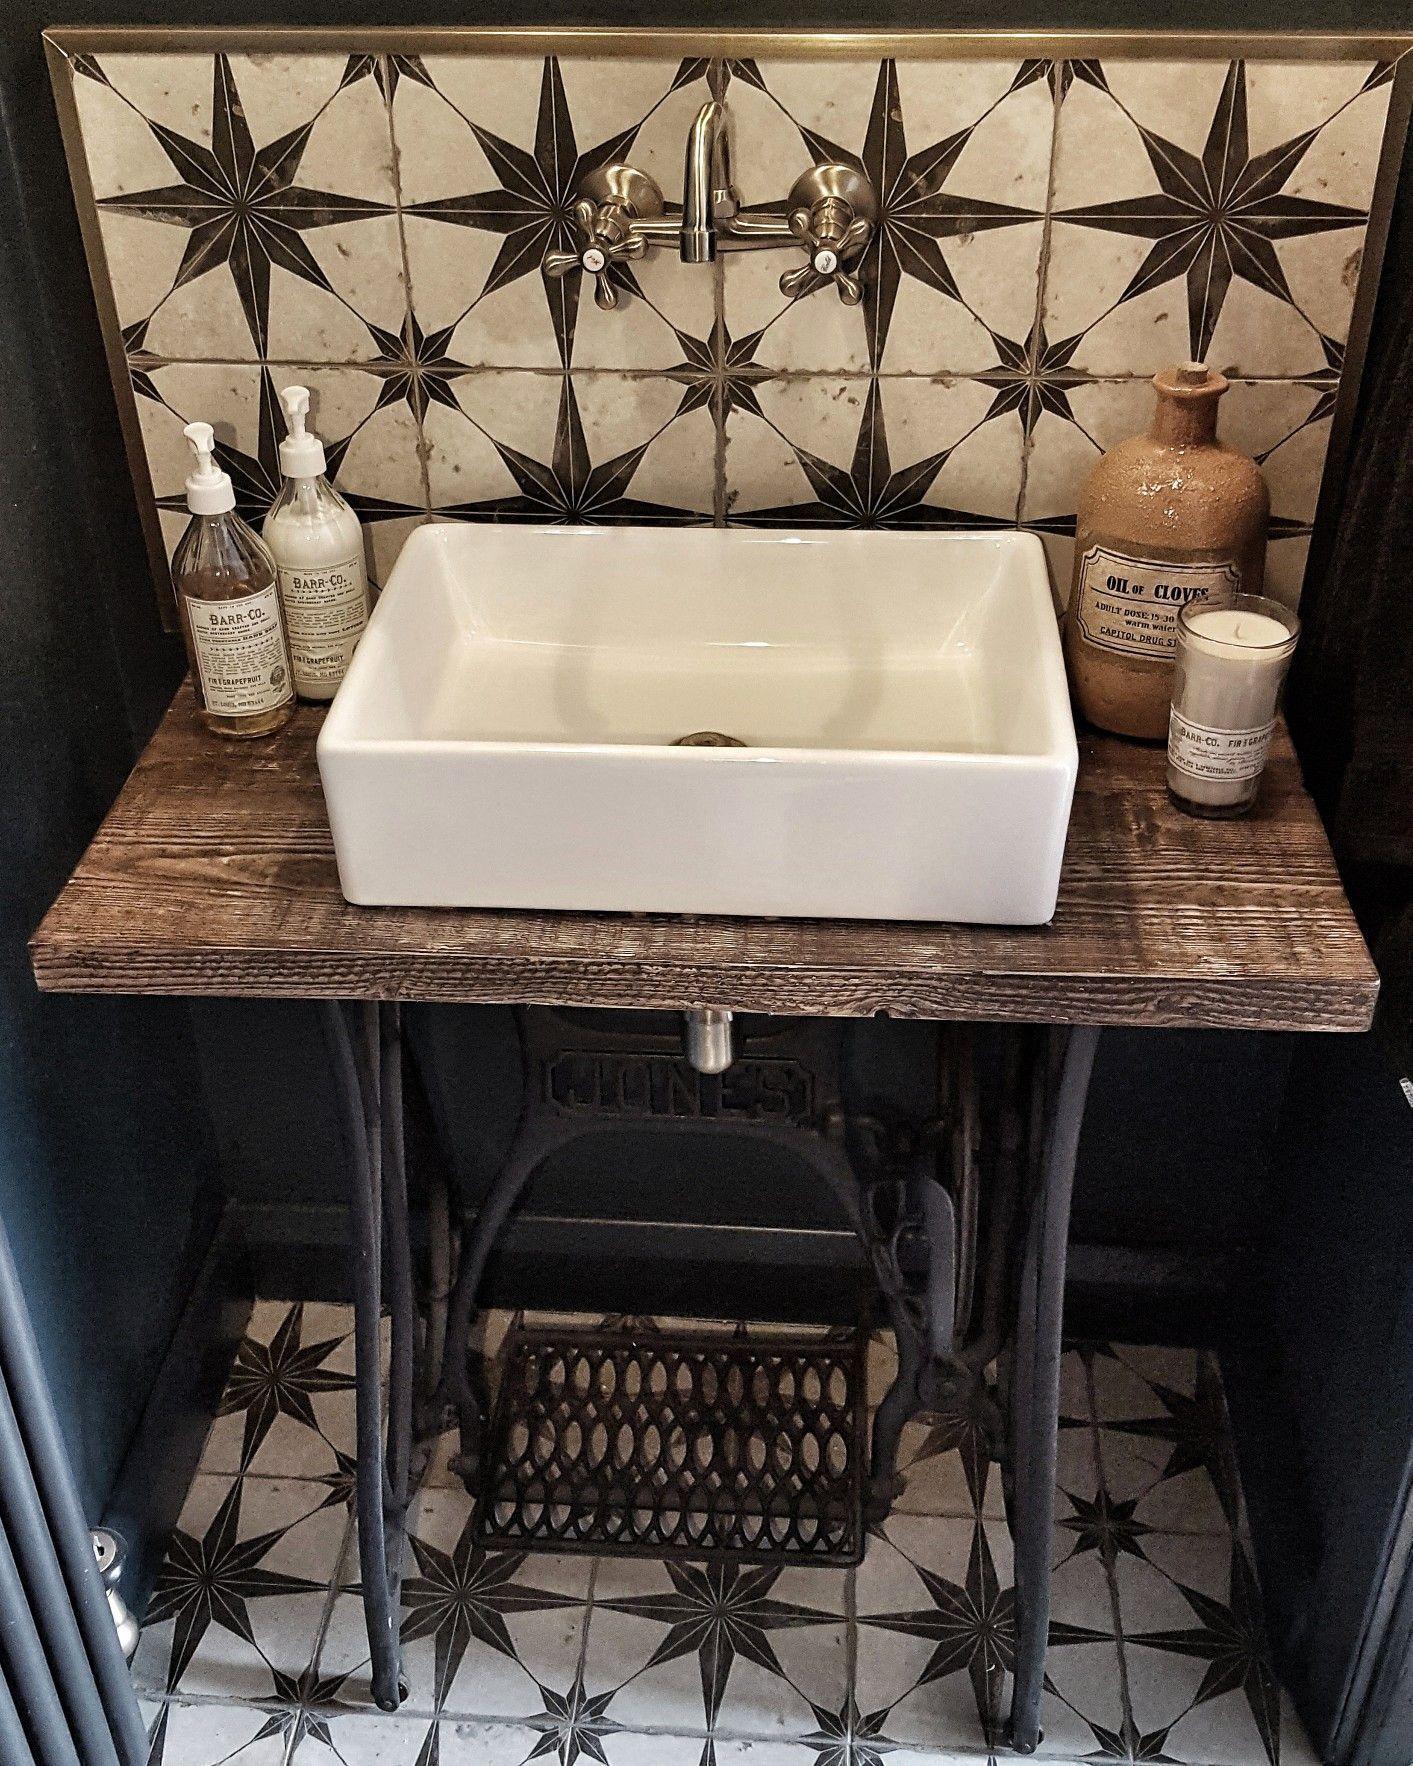 Sewing Machine Table In Bathroom, Star Tile Backsplash